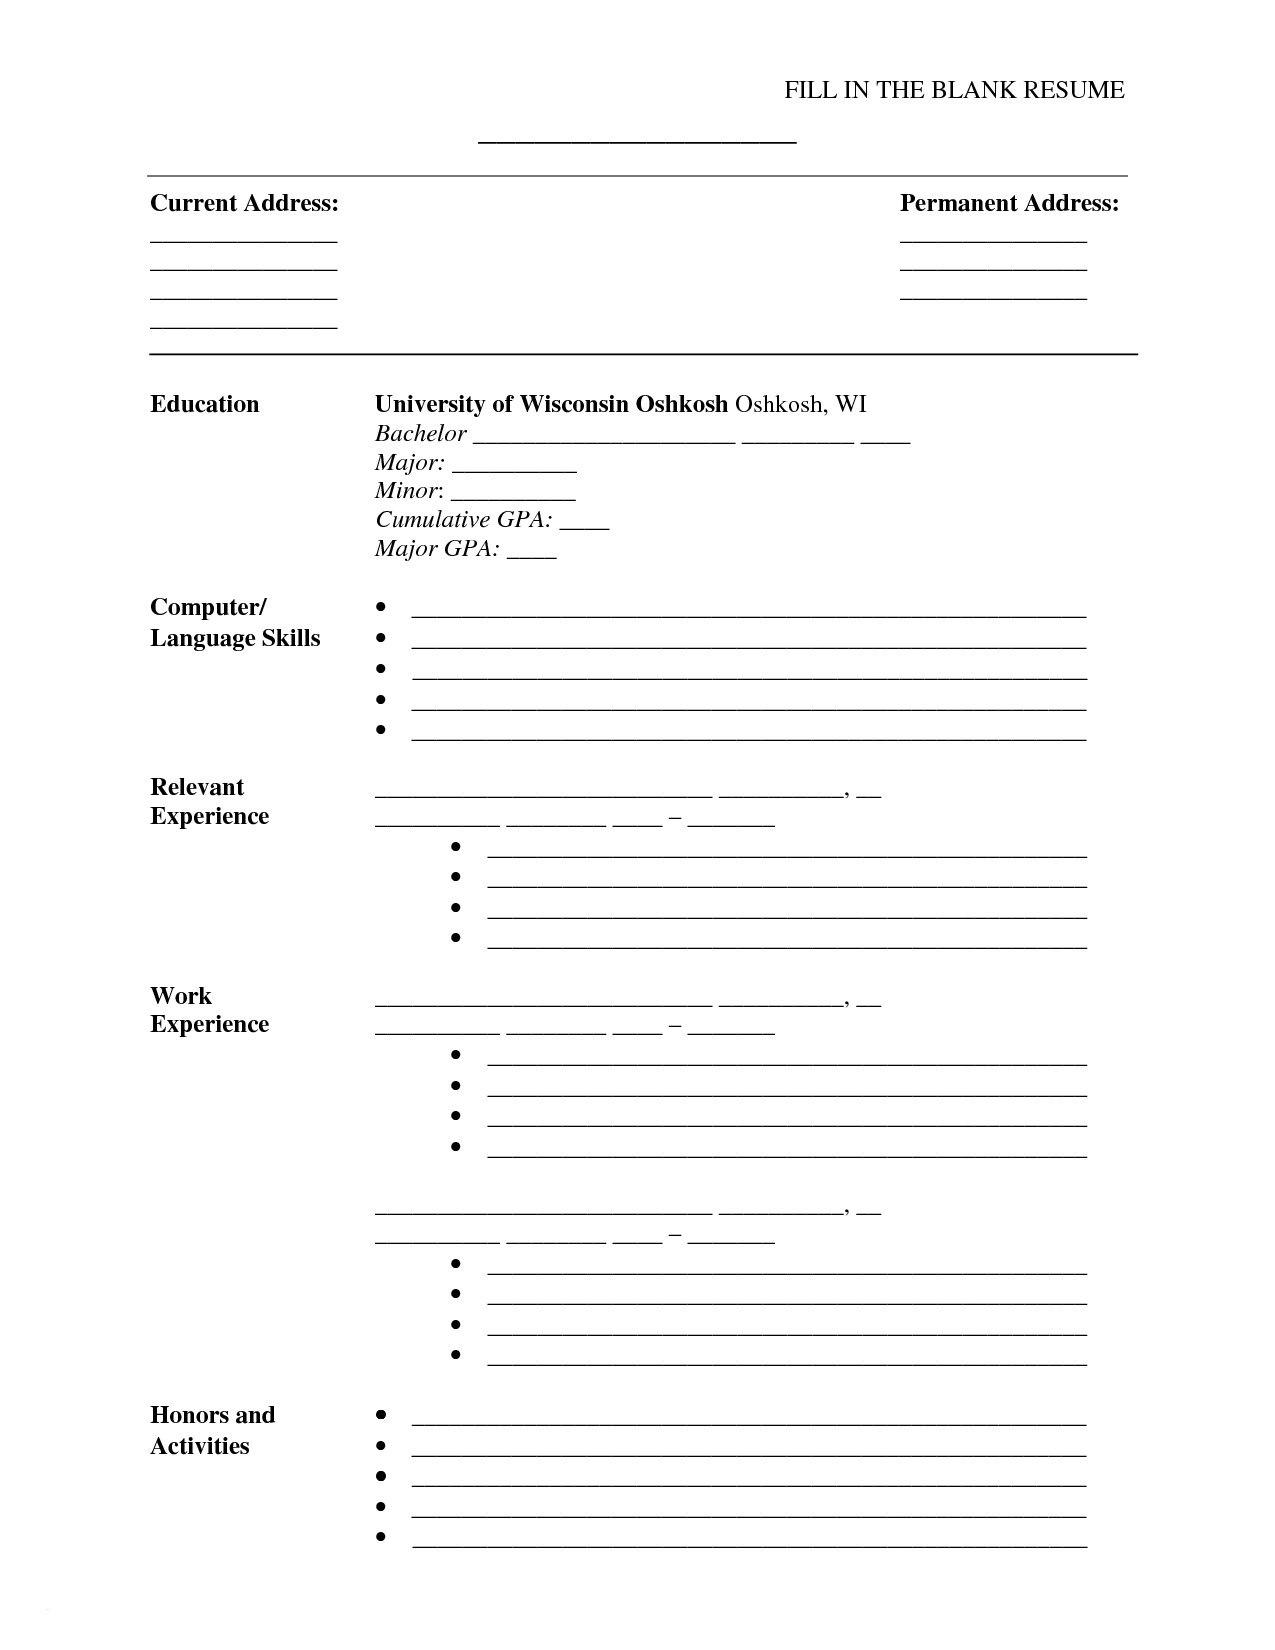 Printable Resume Maker - Tjfs-Journal - Free Printable Resume Templates Download